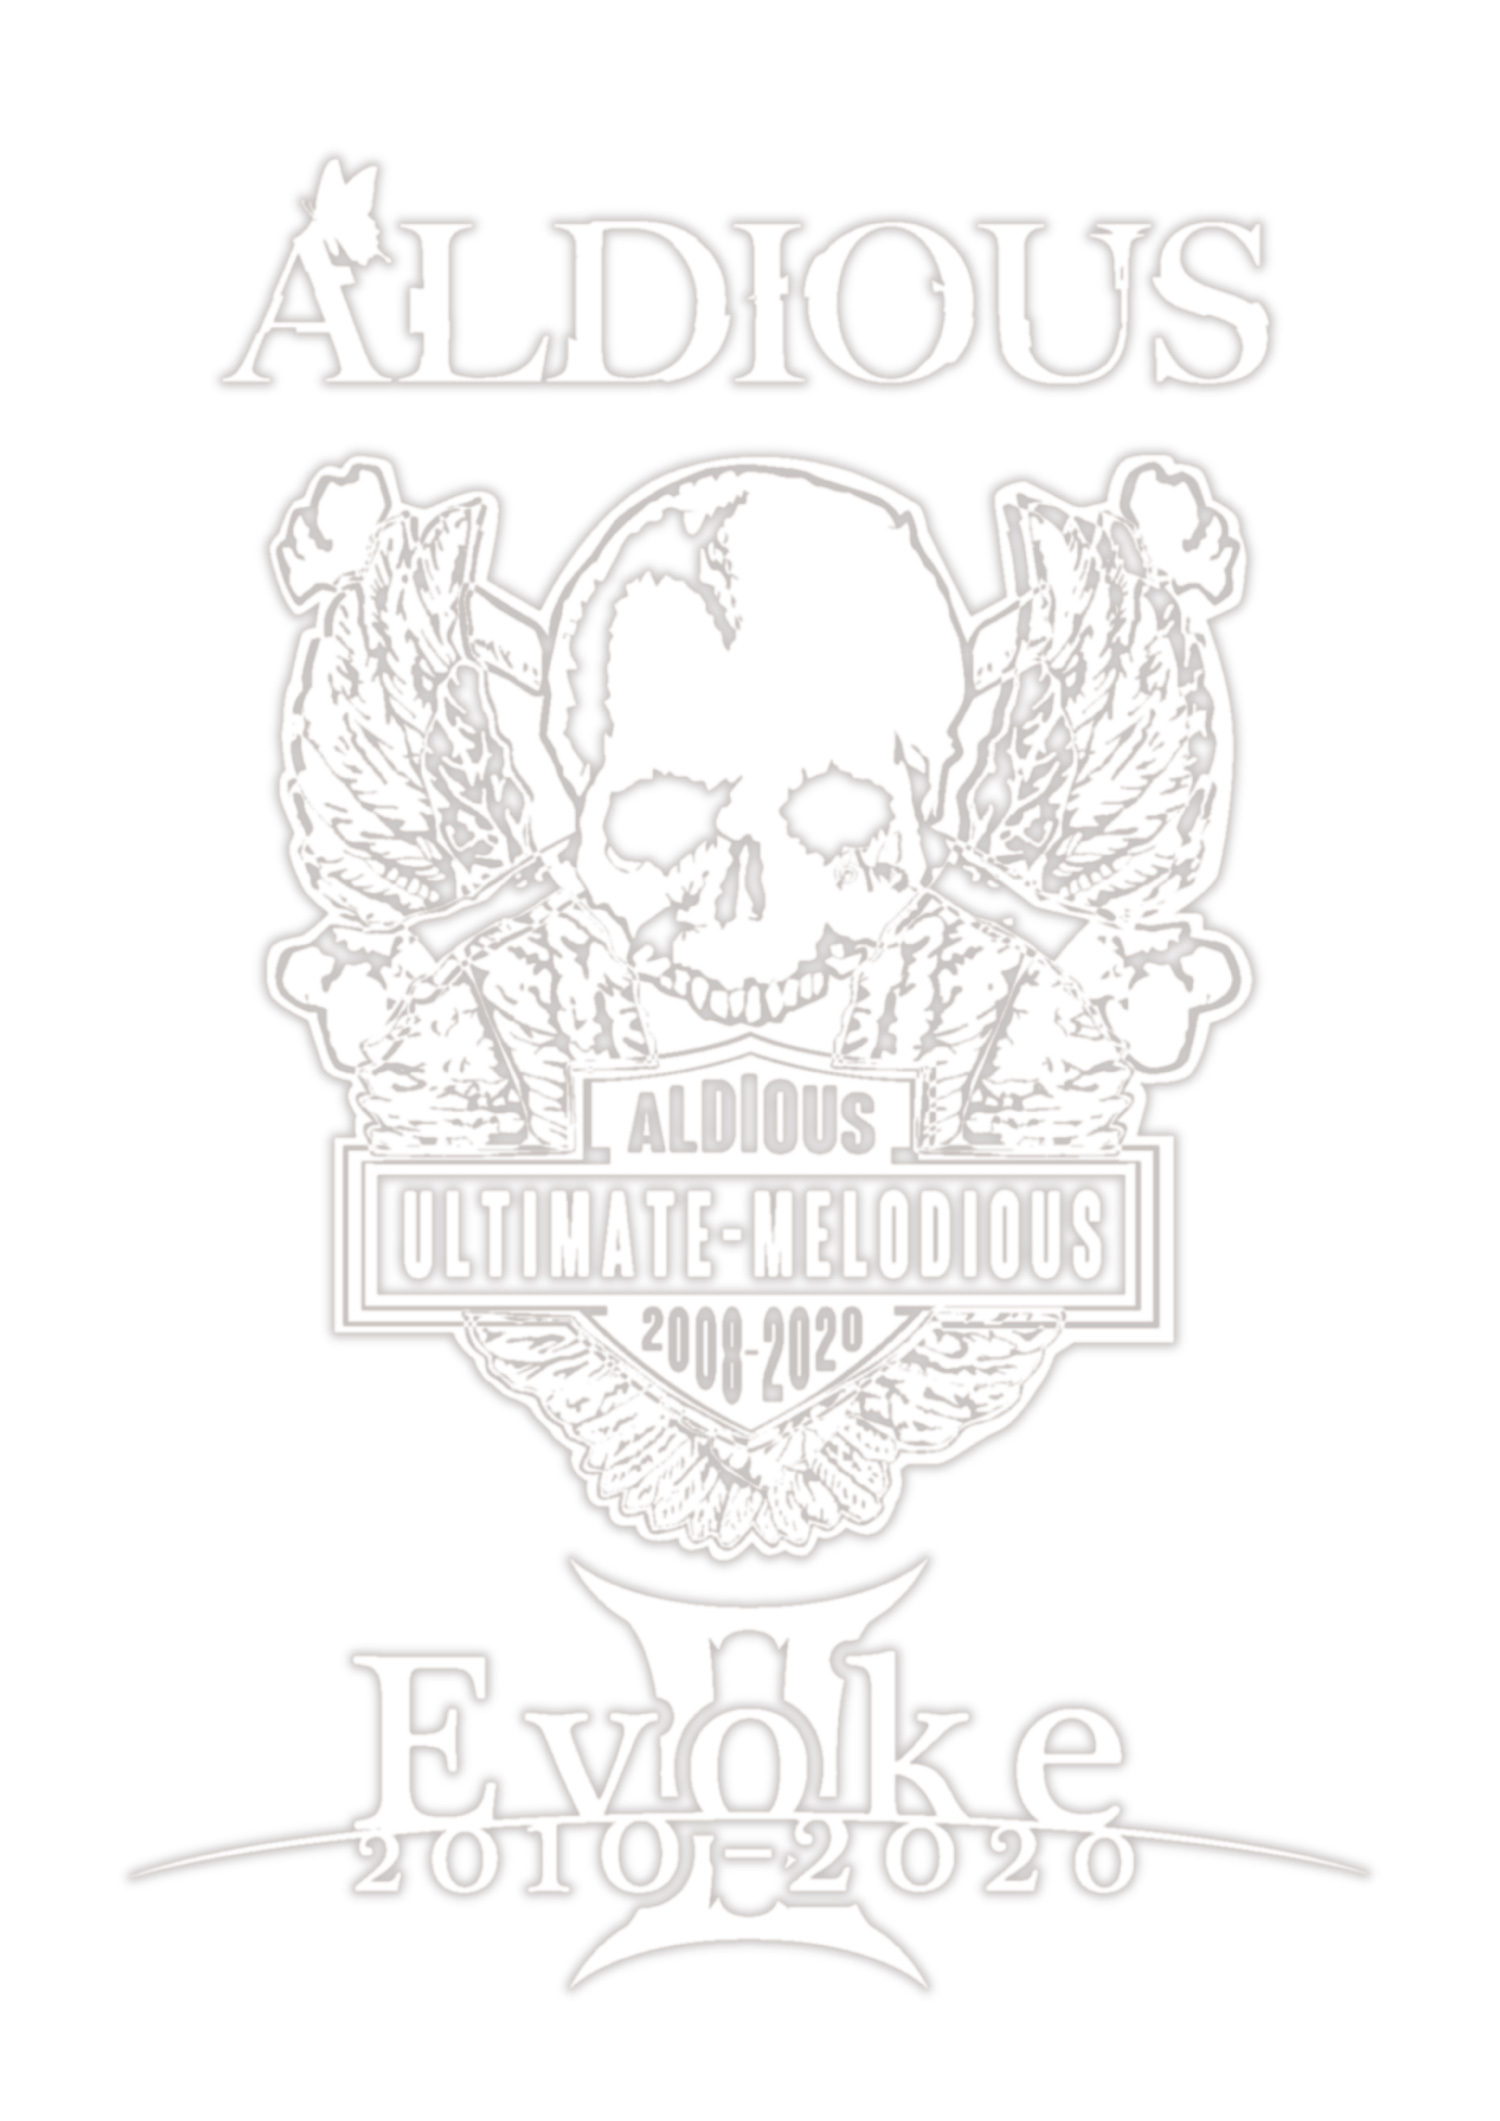 8thアルバム『EvokeⅡ 2010-2020』【オフィシャル・ウェブサイト限定プレミア盤】(4CD+DVD)